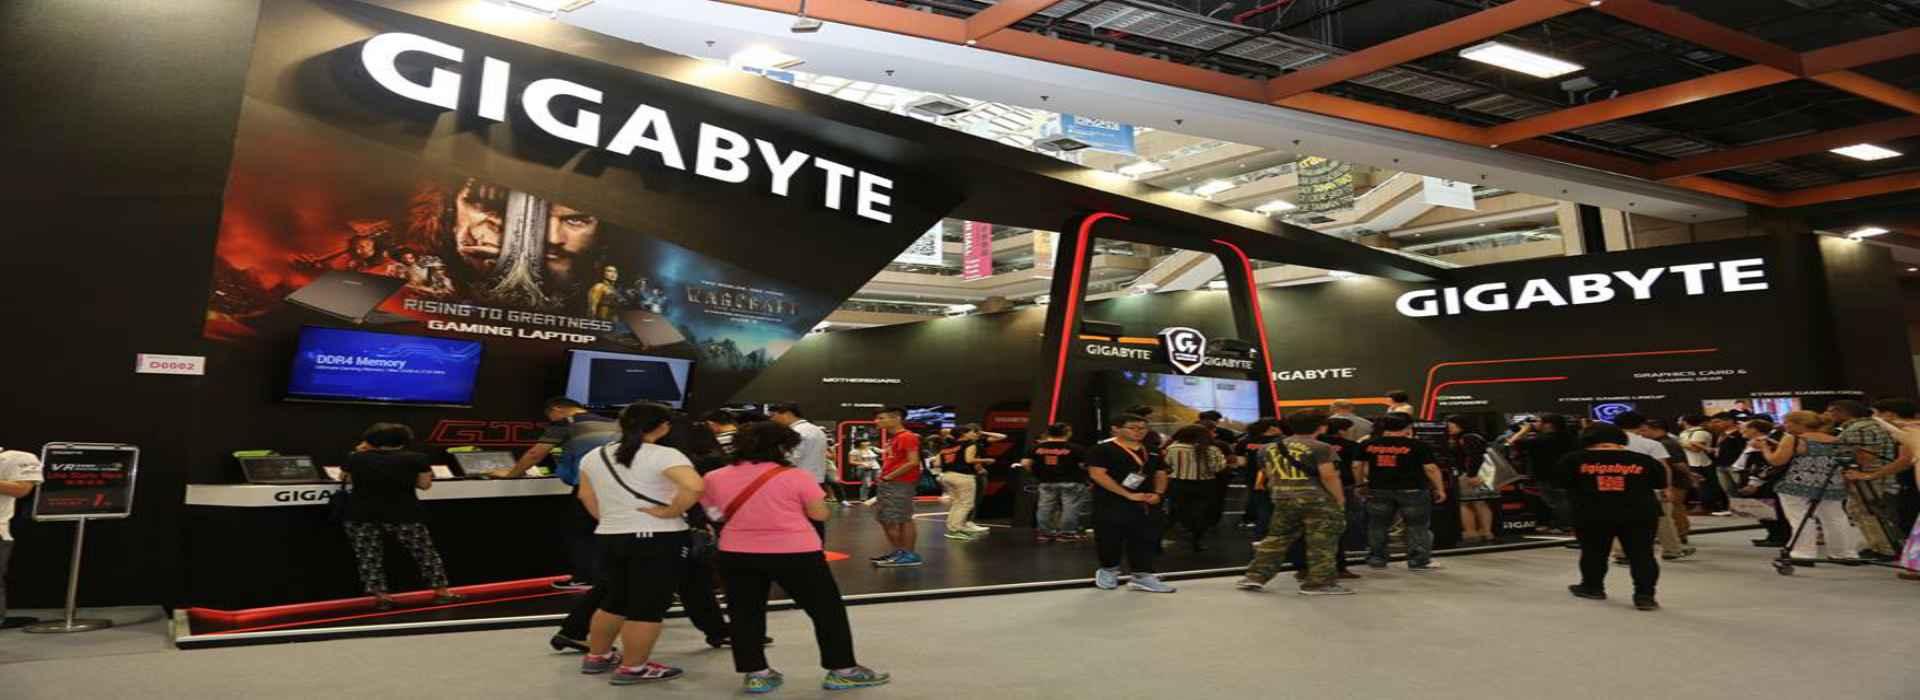 Gigabyte Customer Service Number Malaysia, Address